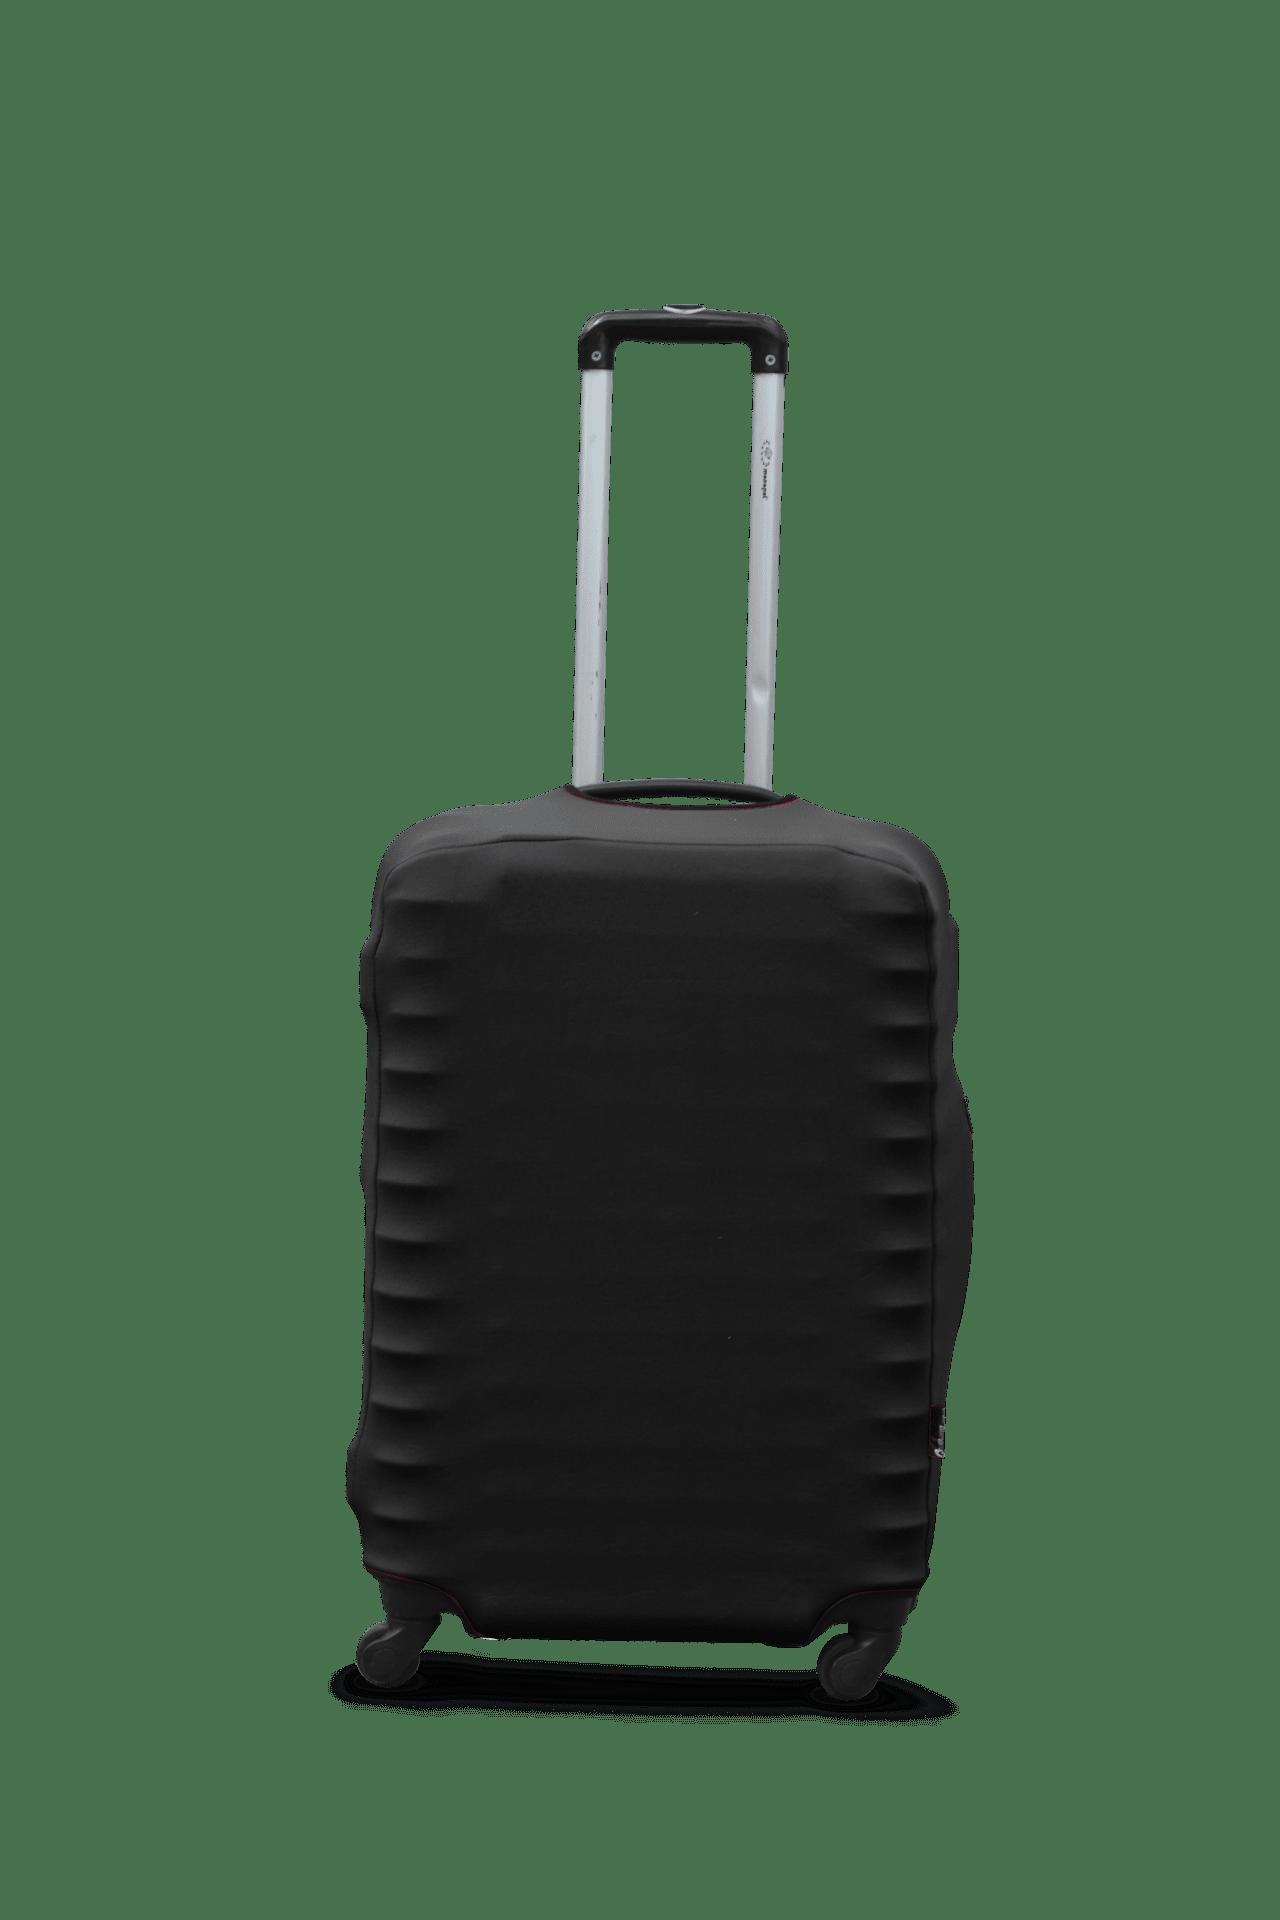 Husa pentru valiza daiving Cover DAWING S BLACK